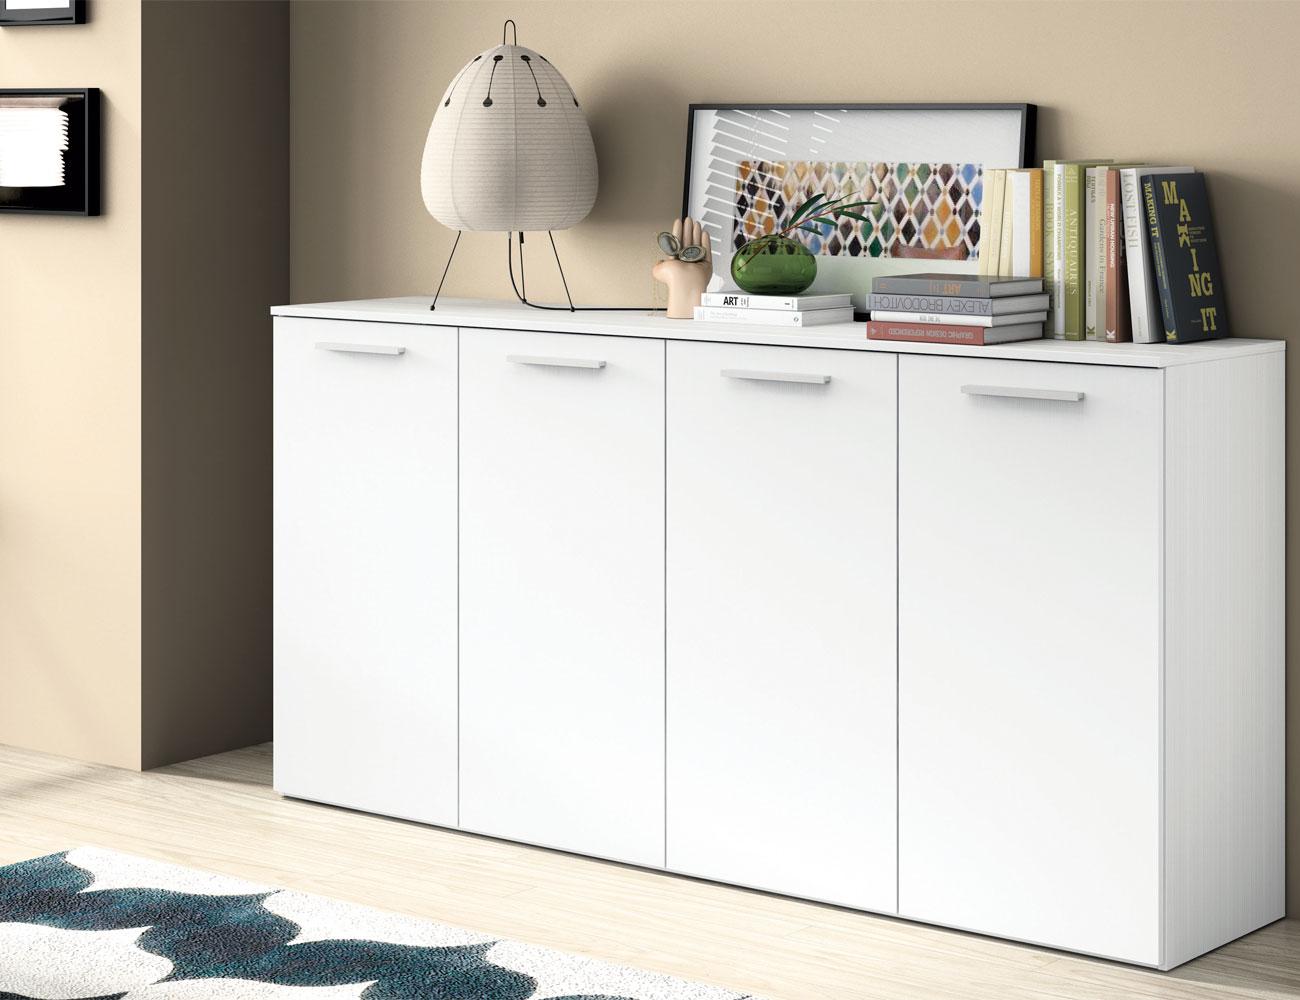 Mueble salon moderno aparador blanco 4141